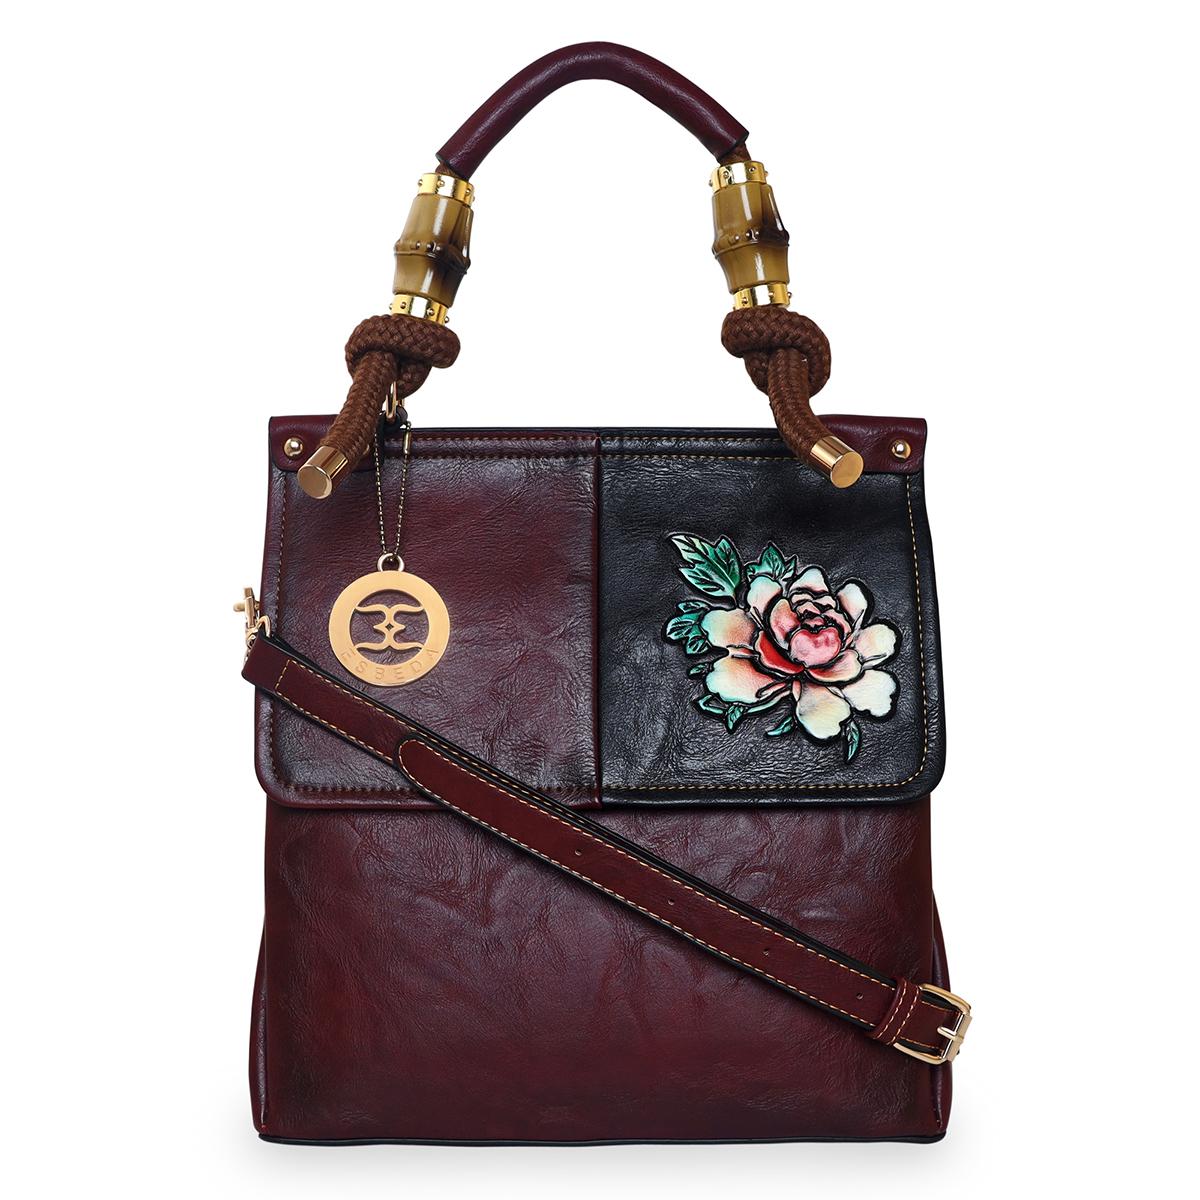 ESBEDA | ESBEDA Maroon Color Solid Pattern 3D Flower Print Handbag For Women